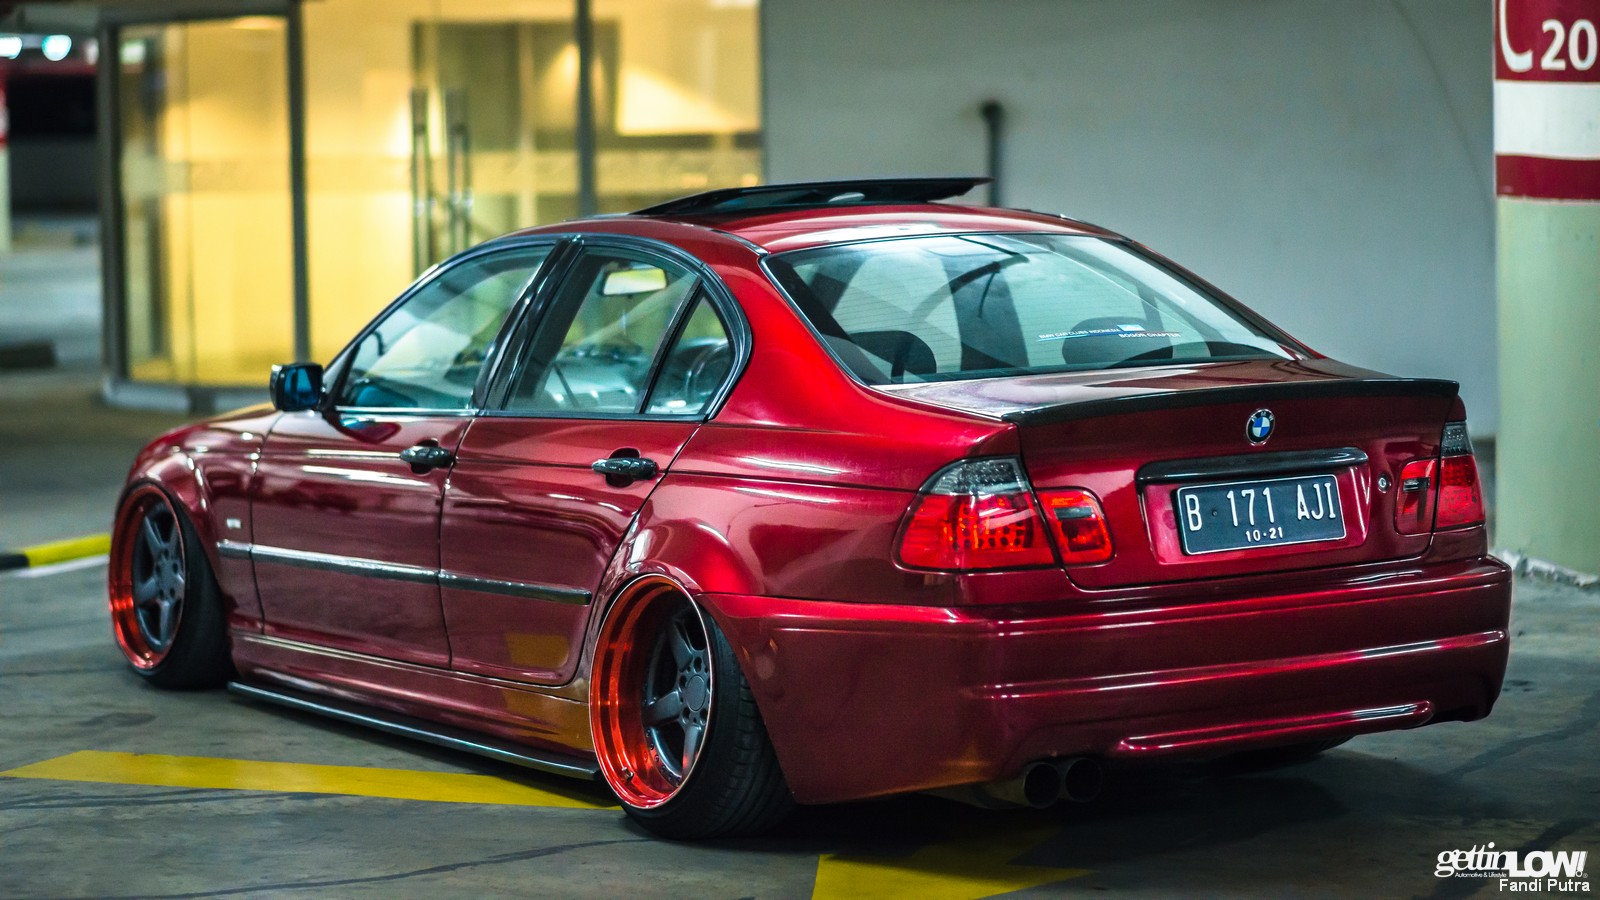 BMW-Maroon-gesrex_16